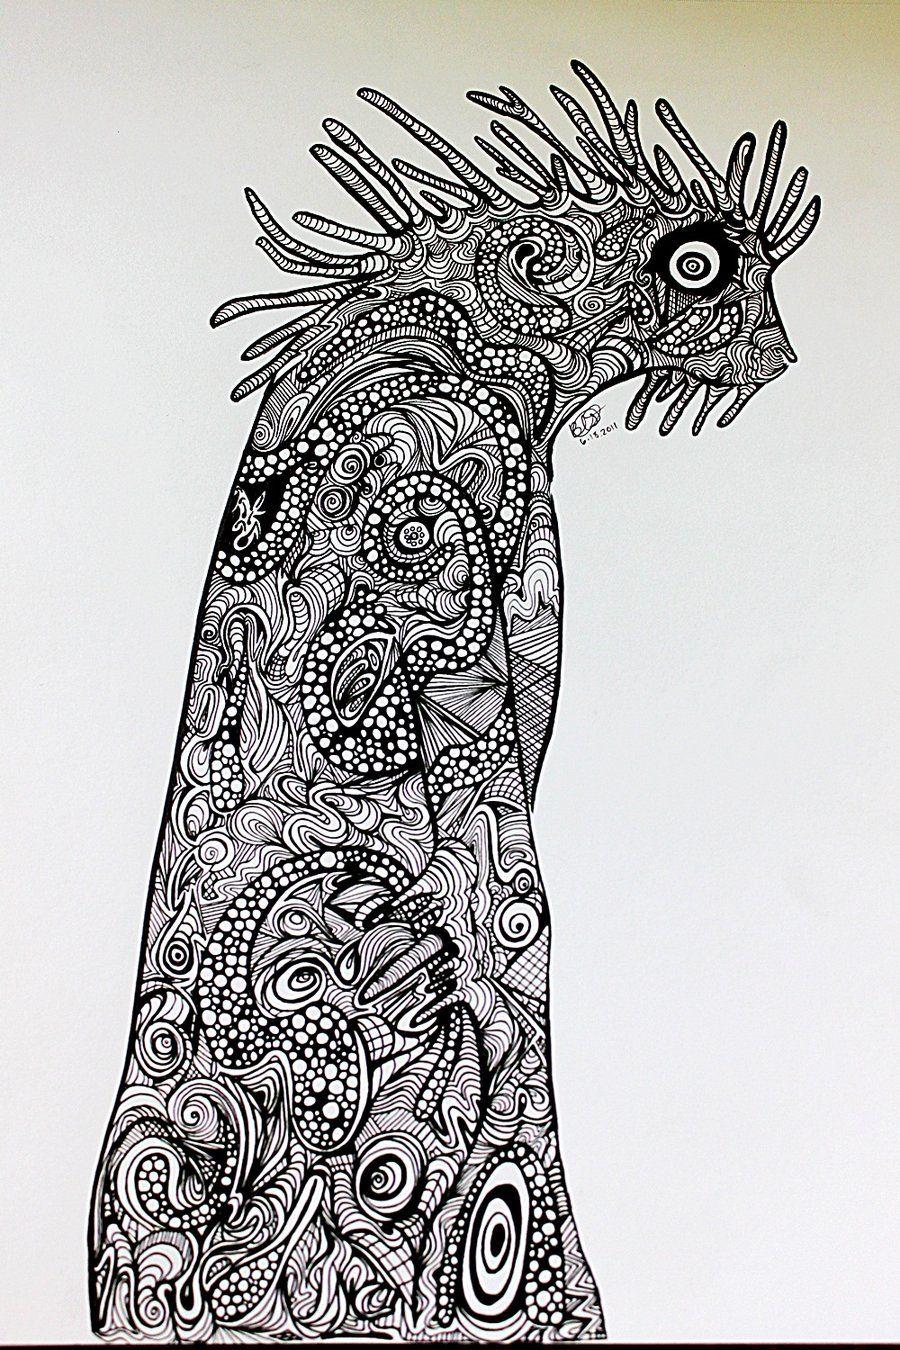 Night Walker By Princerul Deviantart On Deviantart Ghibli